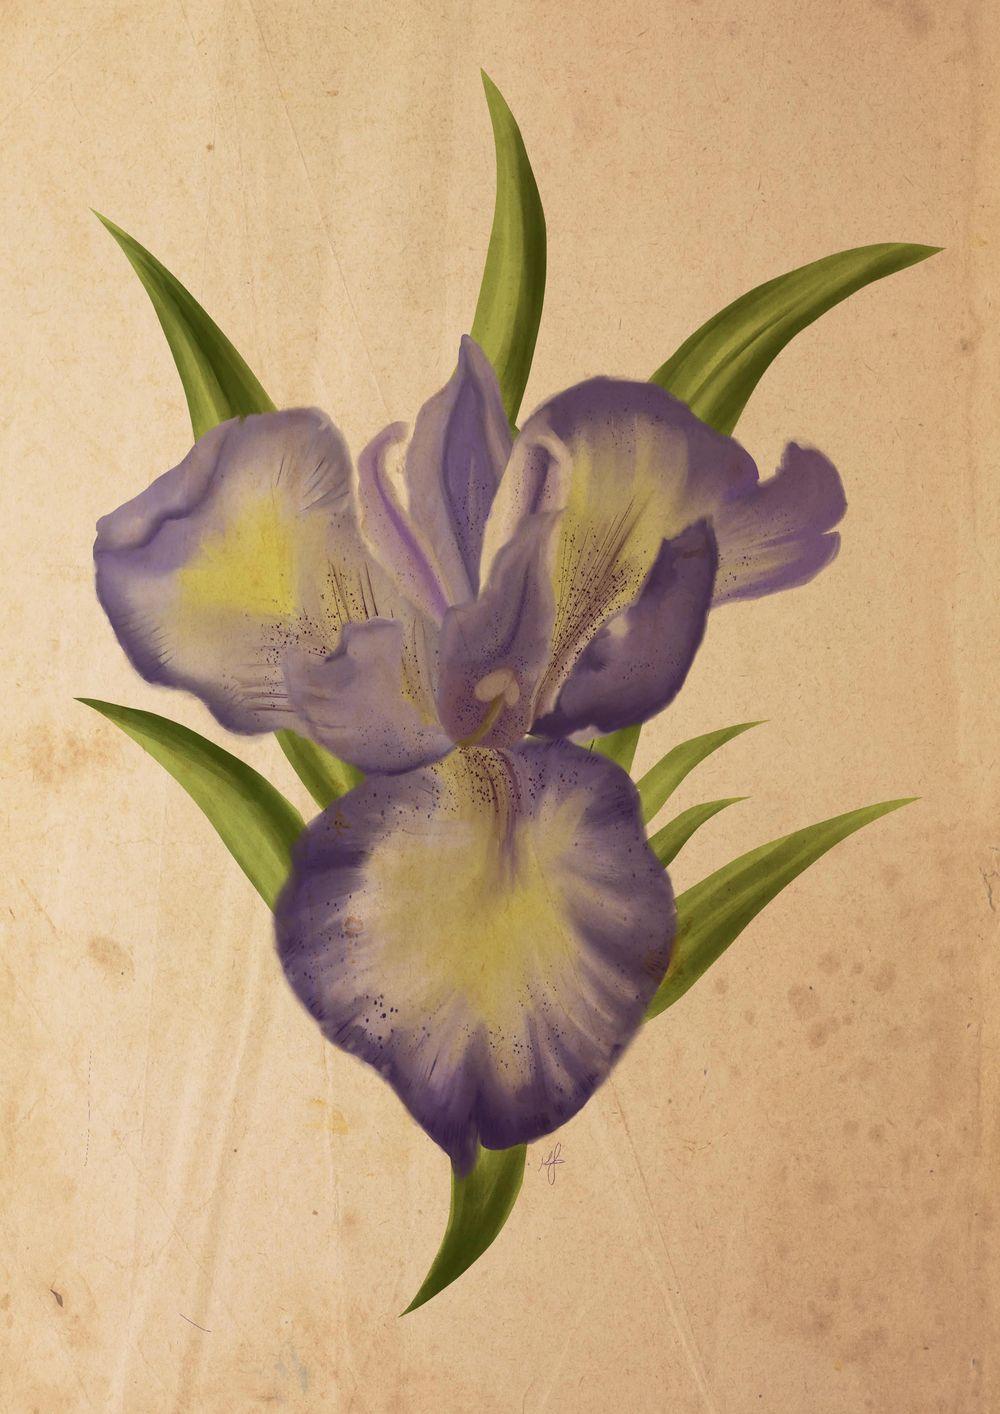 Iris study - image 1 - student project